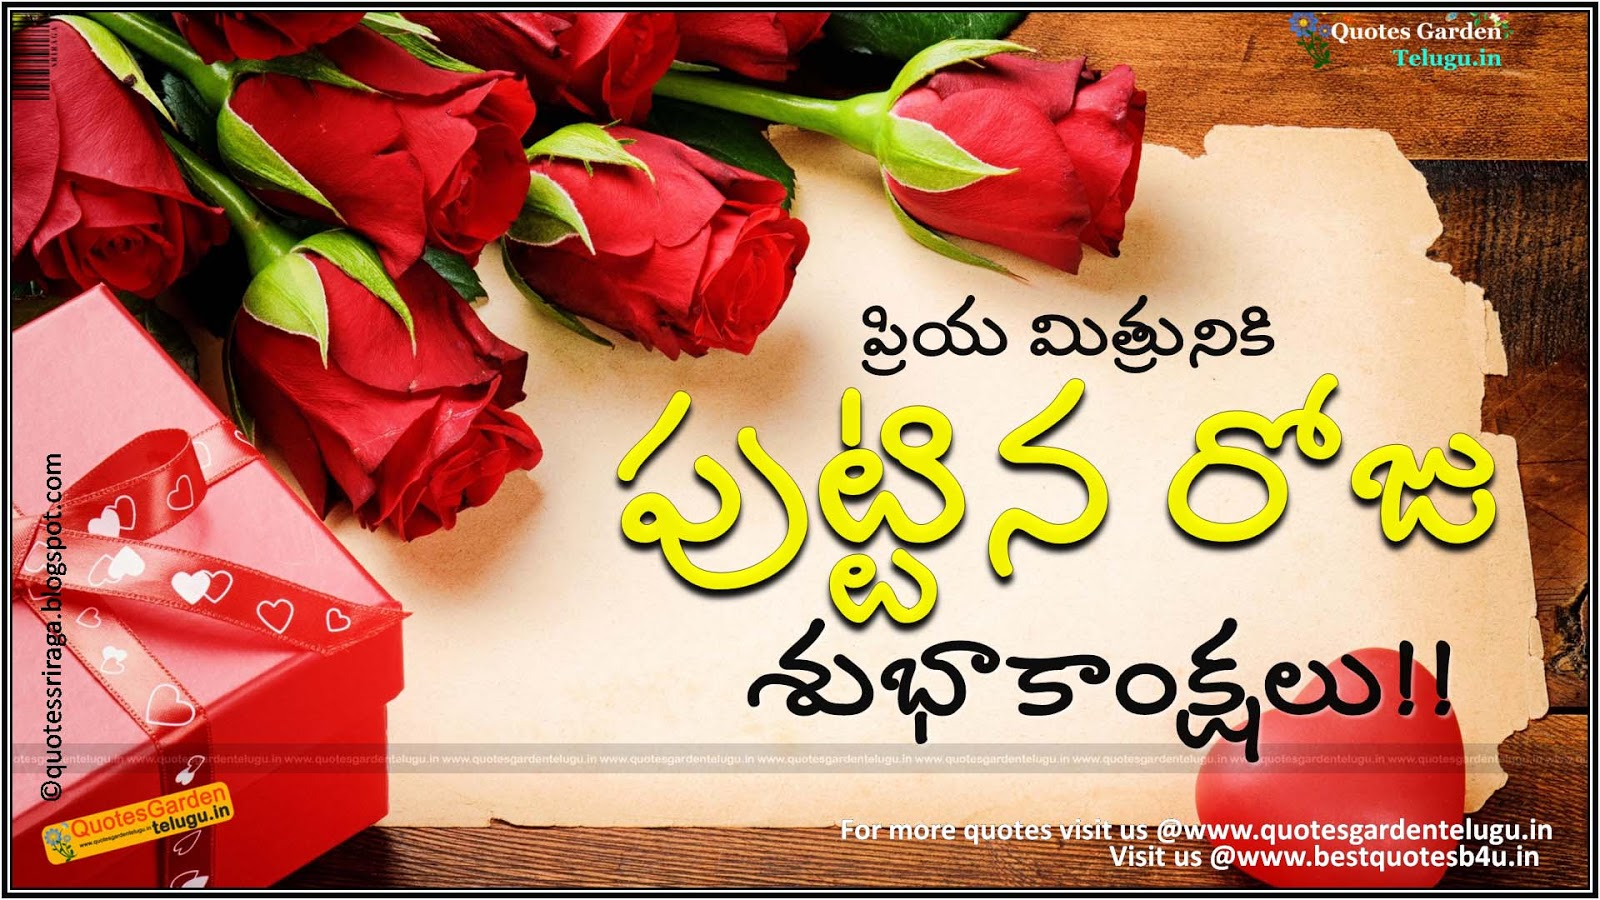 Happy Birthday Greetings in Telugu QUOTES GARDEN TELUGU – Telugu Birthday Greetings